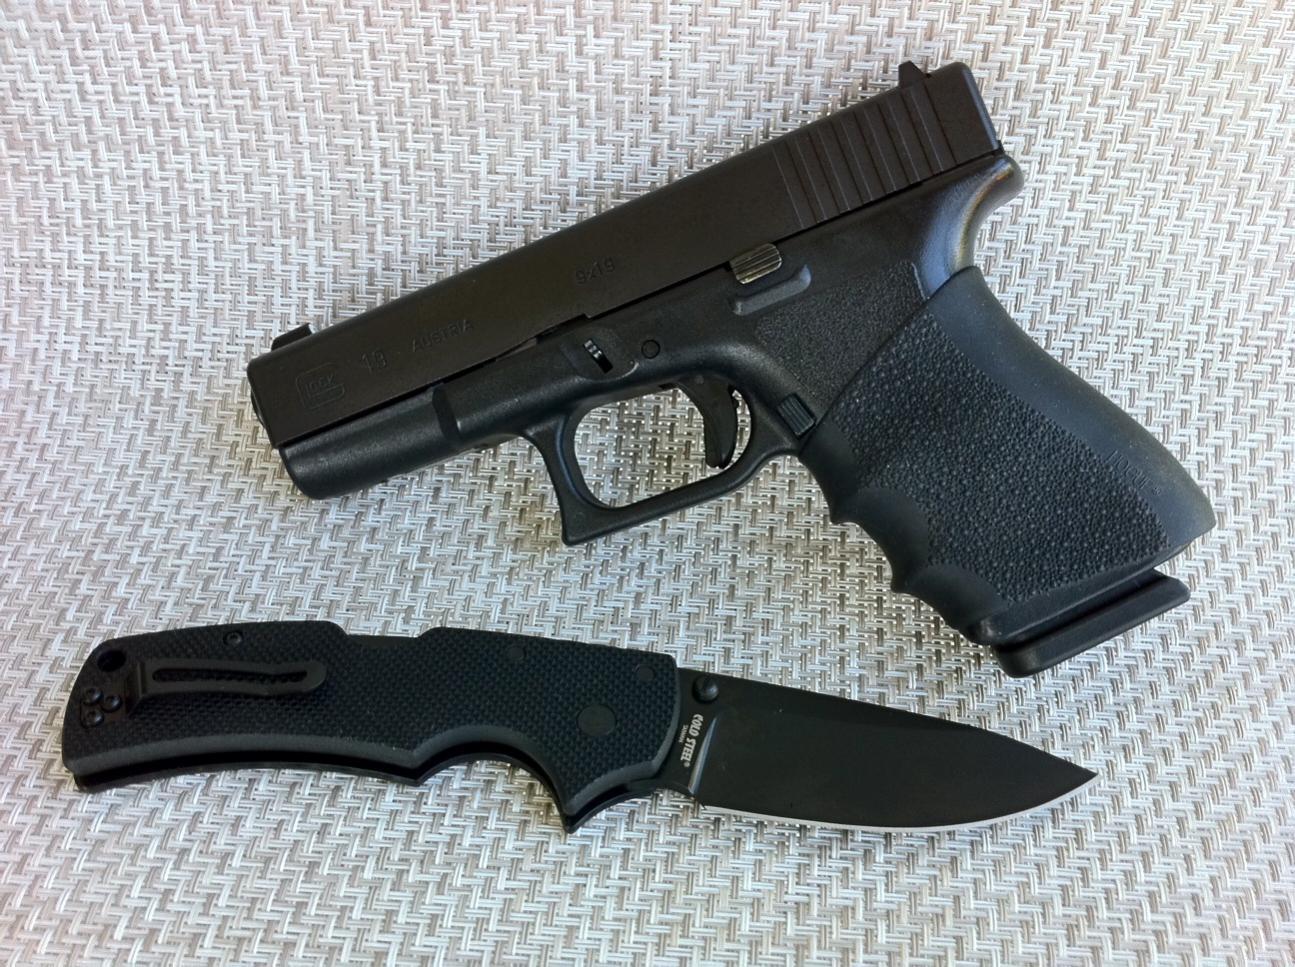 Gen 4 Glock 19 Range report and Review (Long)-photo.jpg